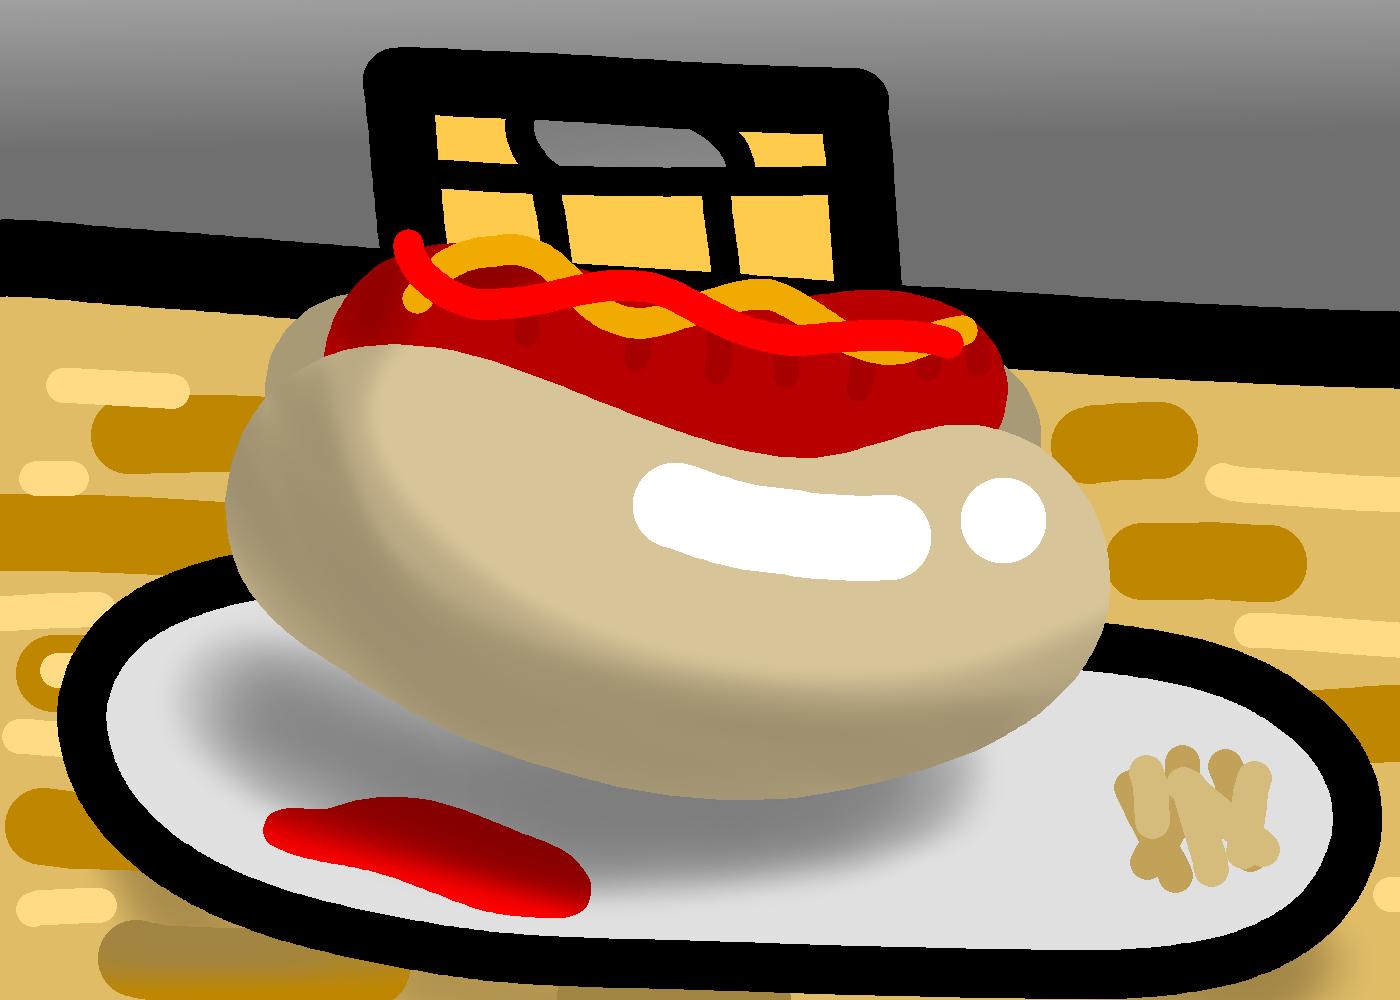 A hotdog